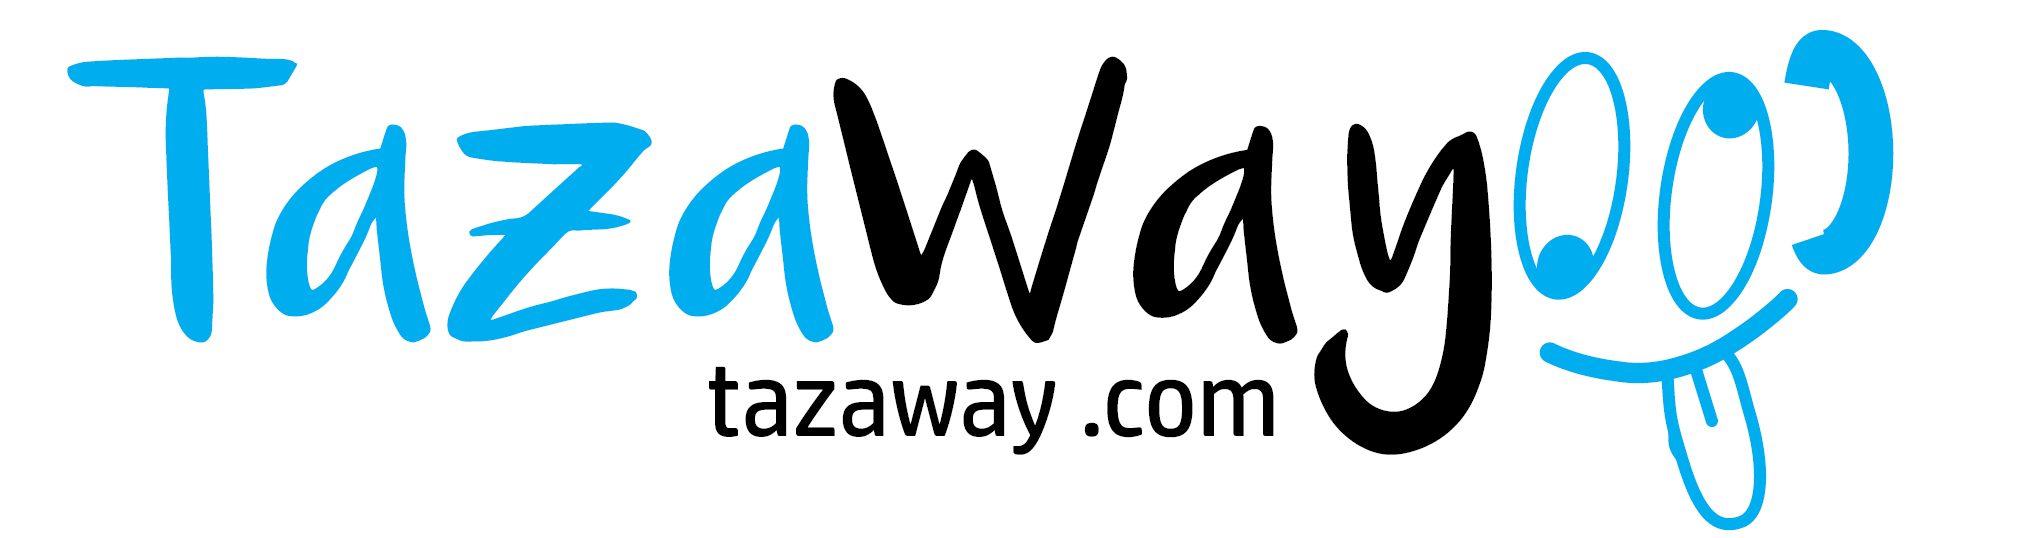 TazaWay.com